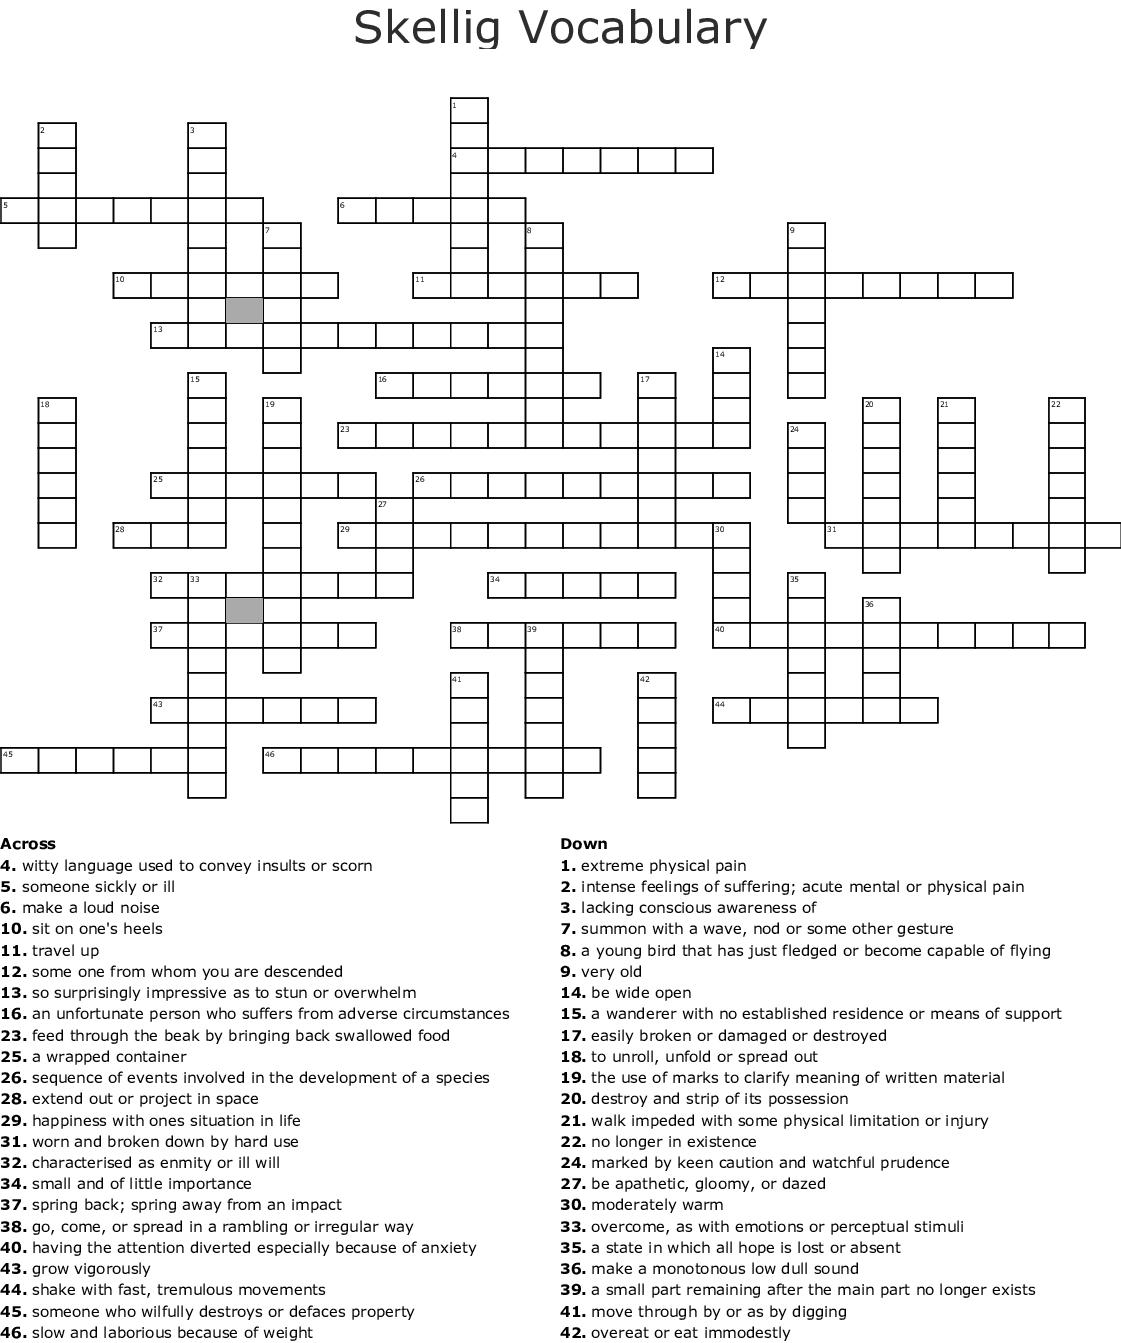 Skellig Vocabulary Crossword